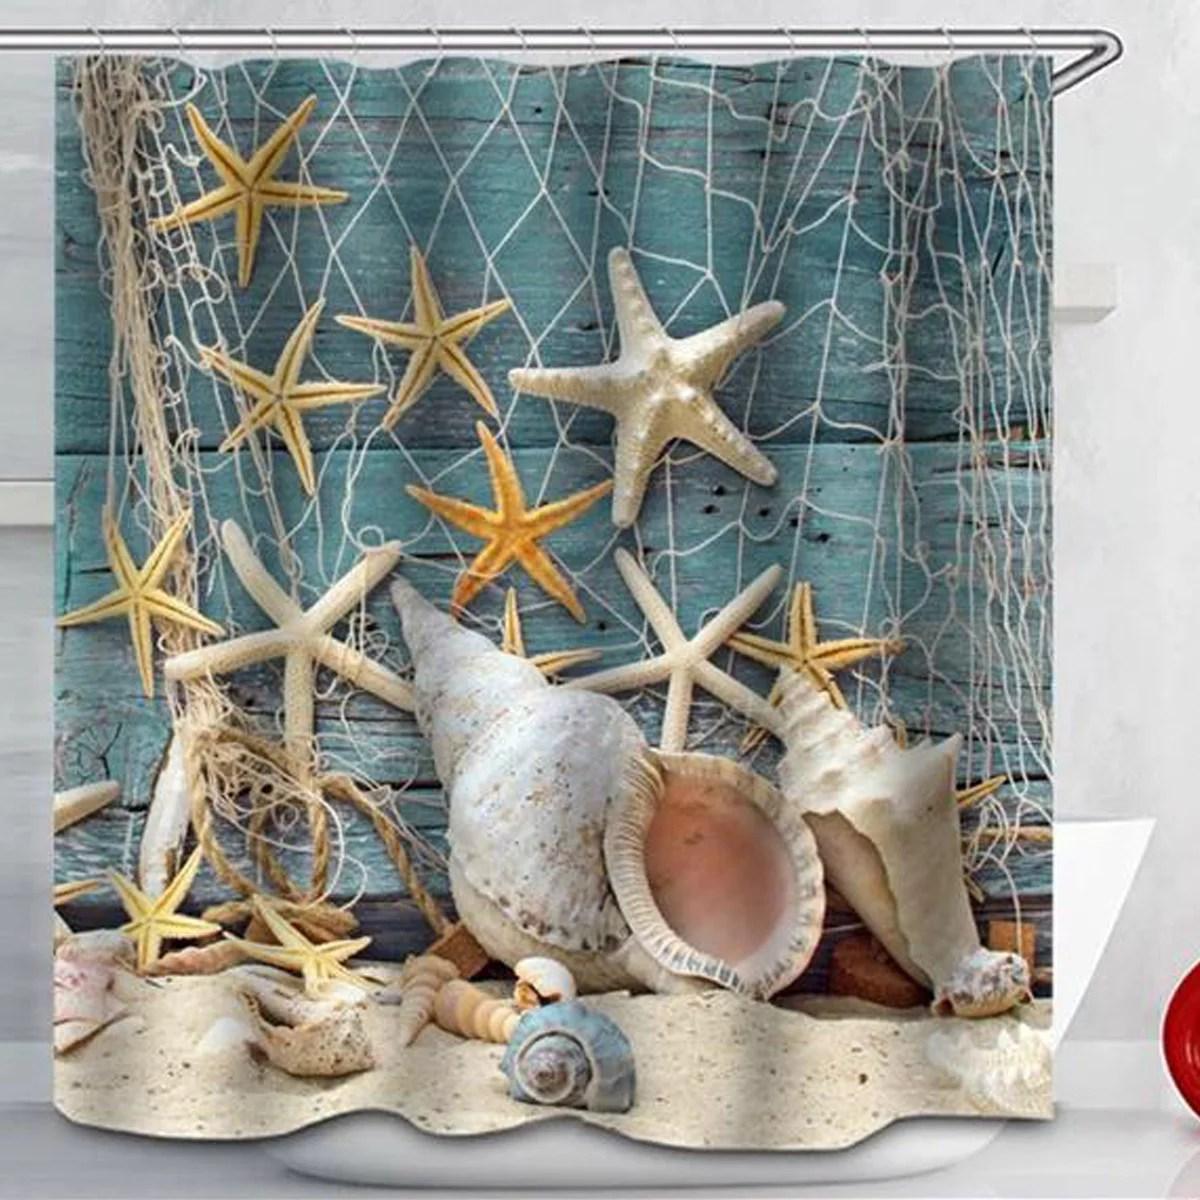 71 x71 sea shell shower curtain waterproof beach curtain decor bathroom set 12 hooks rings home decor christmas gift